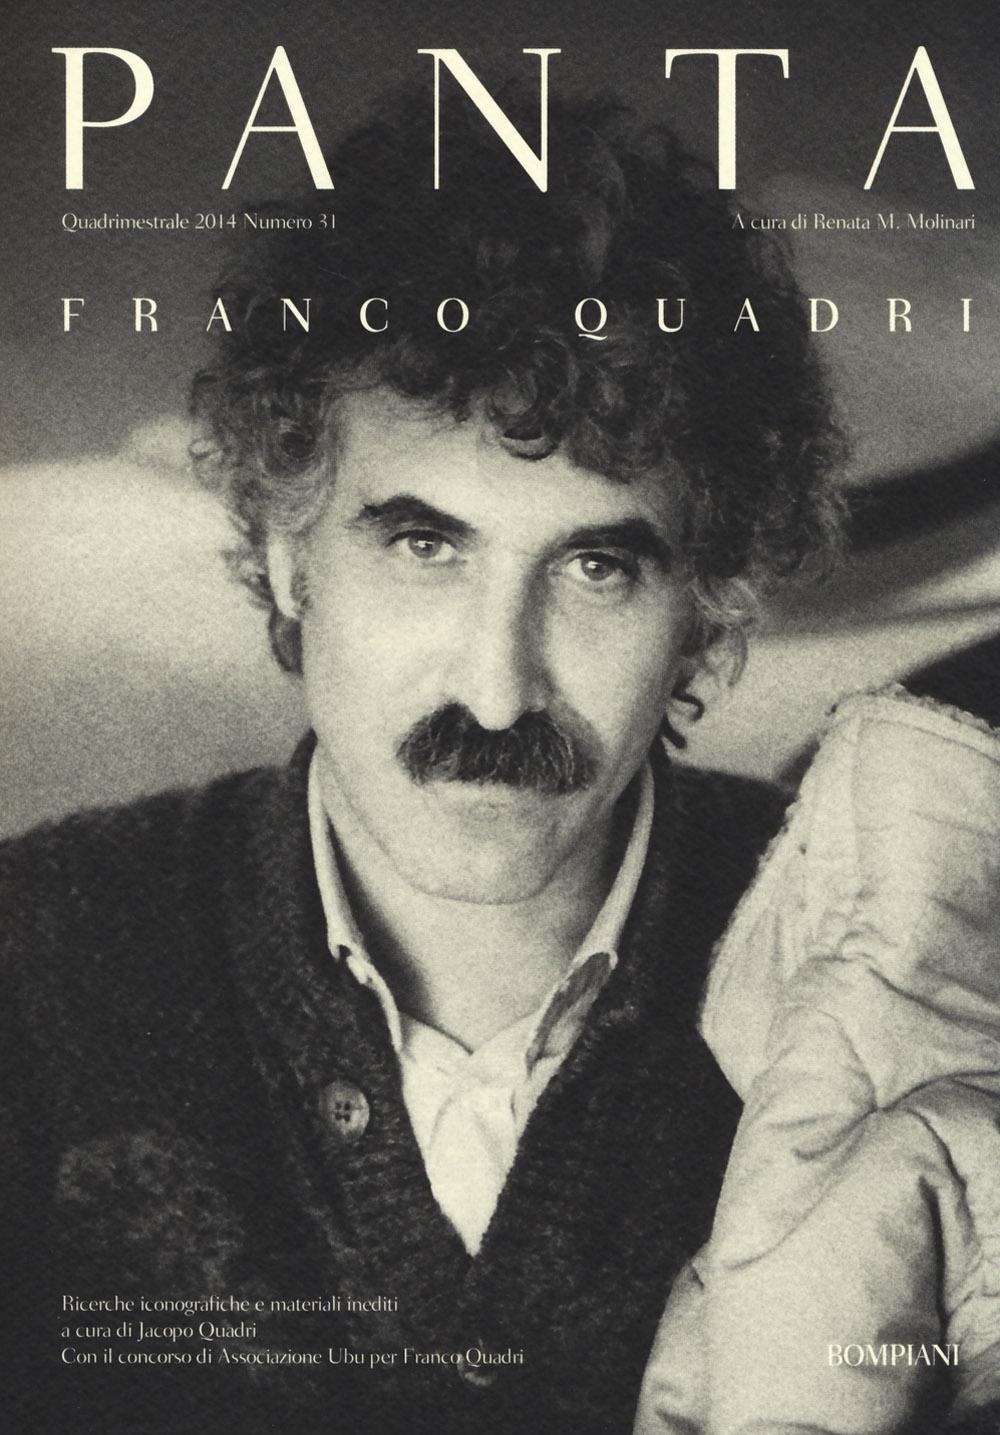 Panta. Franco Quadri